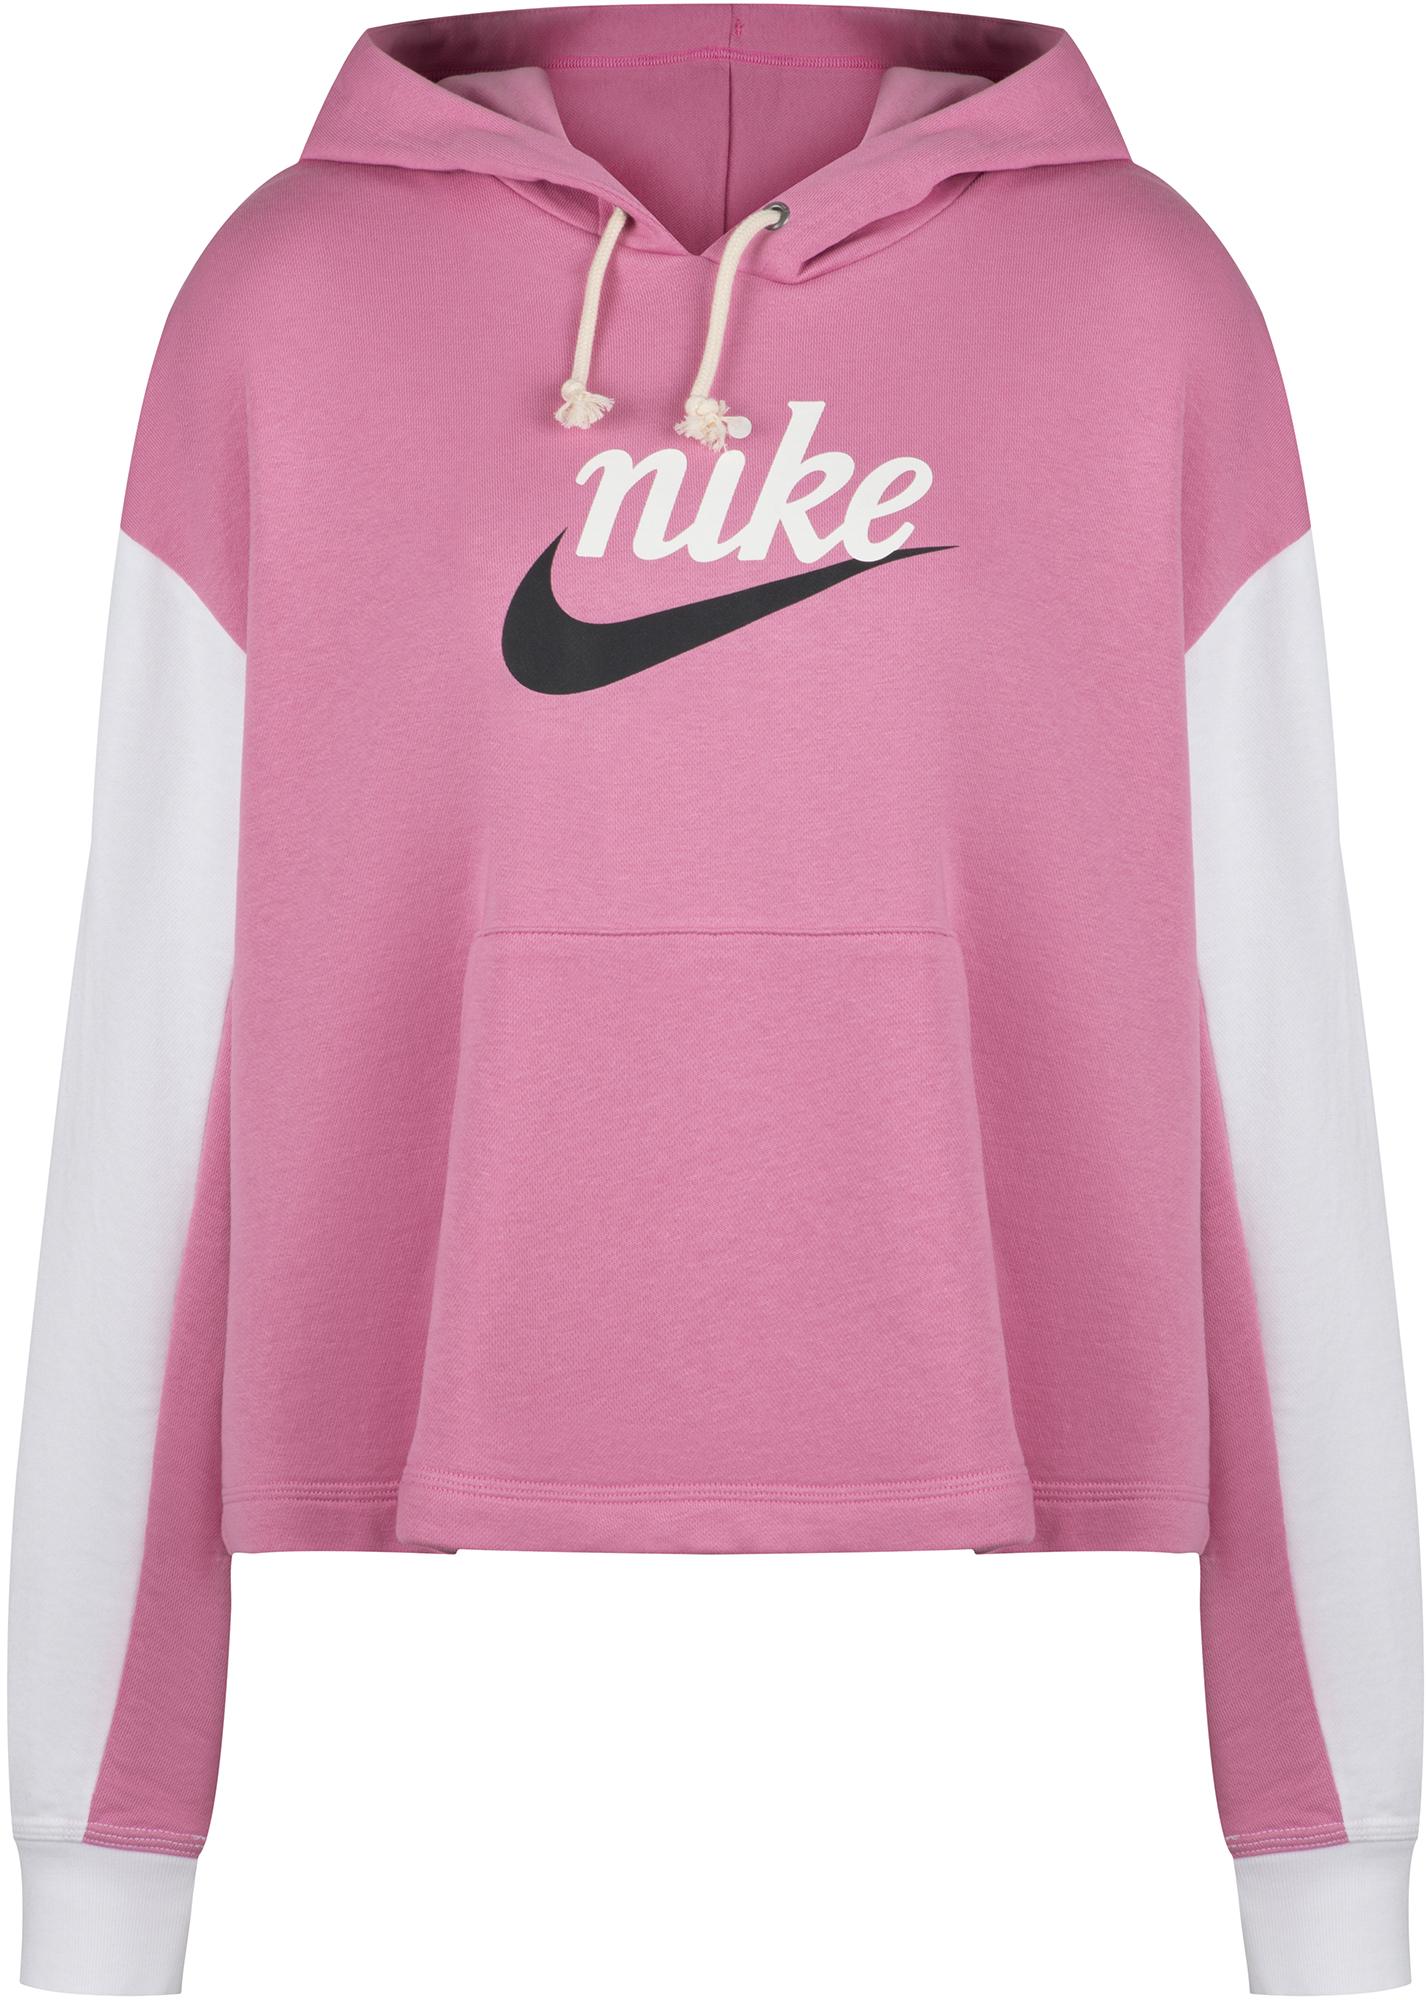 цена Nike Худи женская Nike Sportswear Varsity, Plus Size, размер 56-58 онлайн в 2017 году